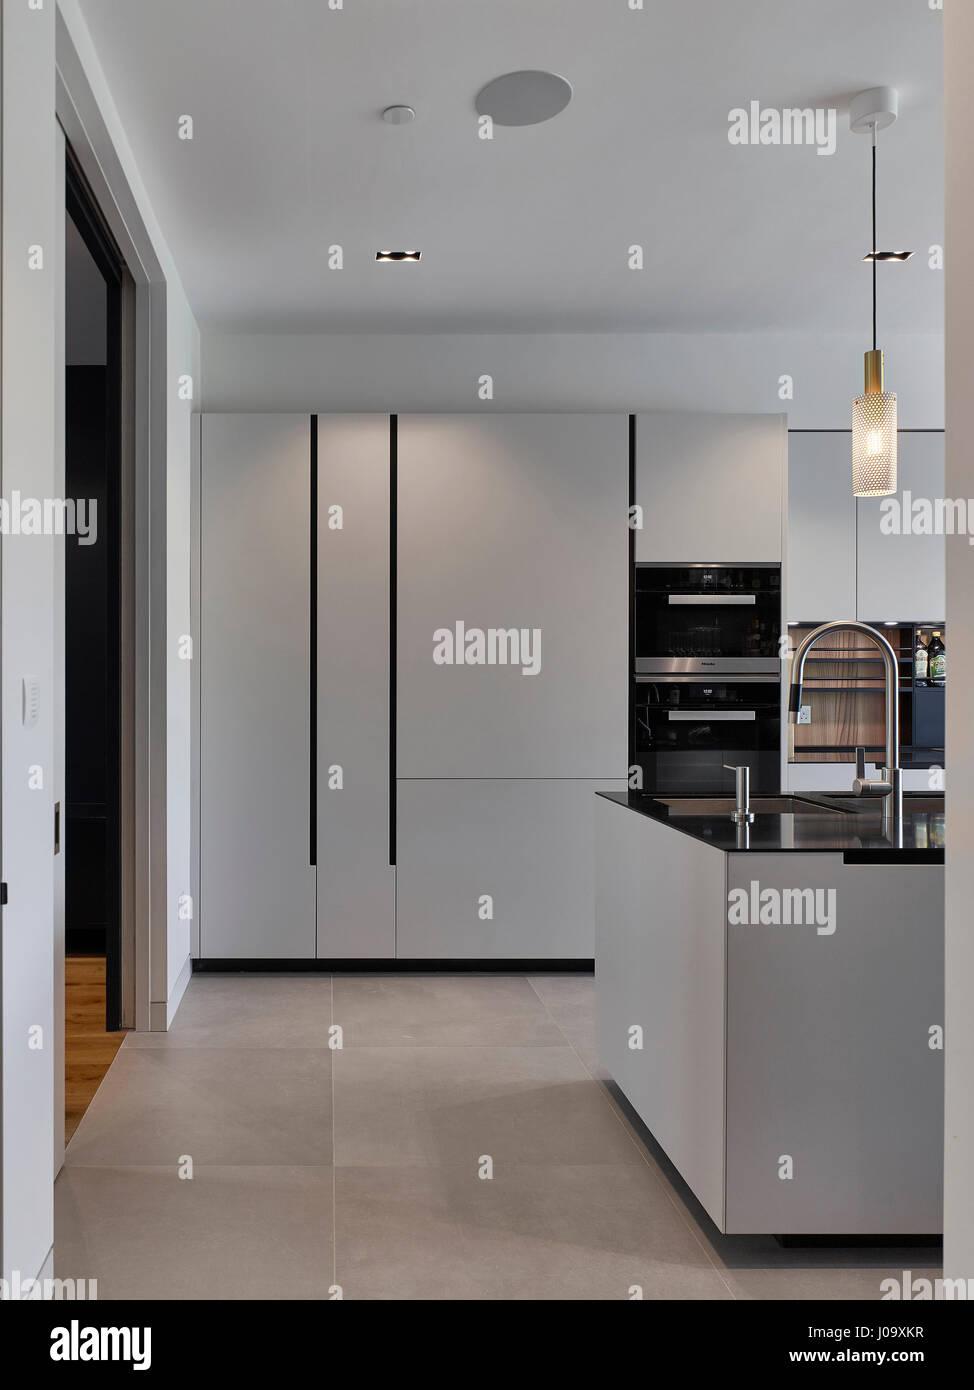 Kitchen. Hampstead Ponds House, London, United Kingdom. Architect: Stiff + Trevillion Architects, 2016. - Stock Image